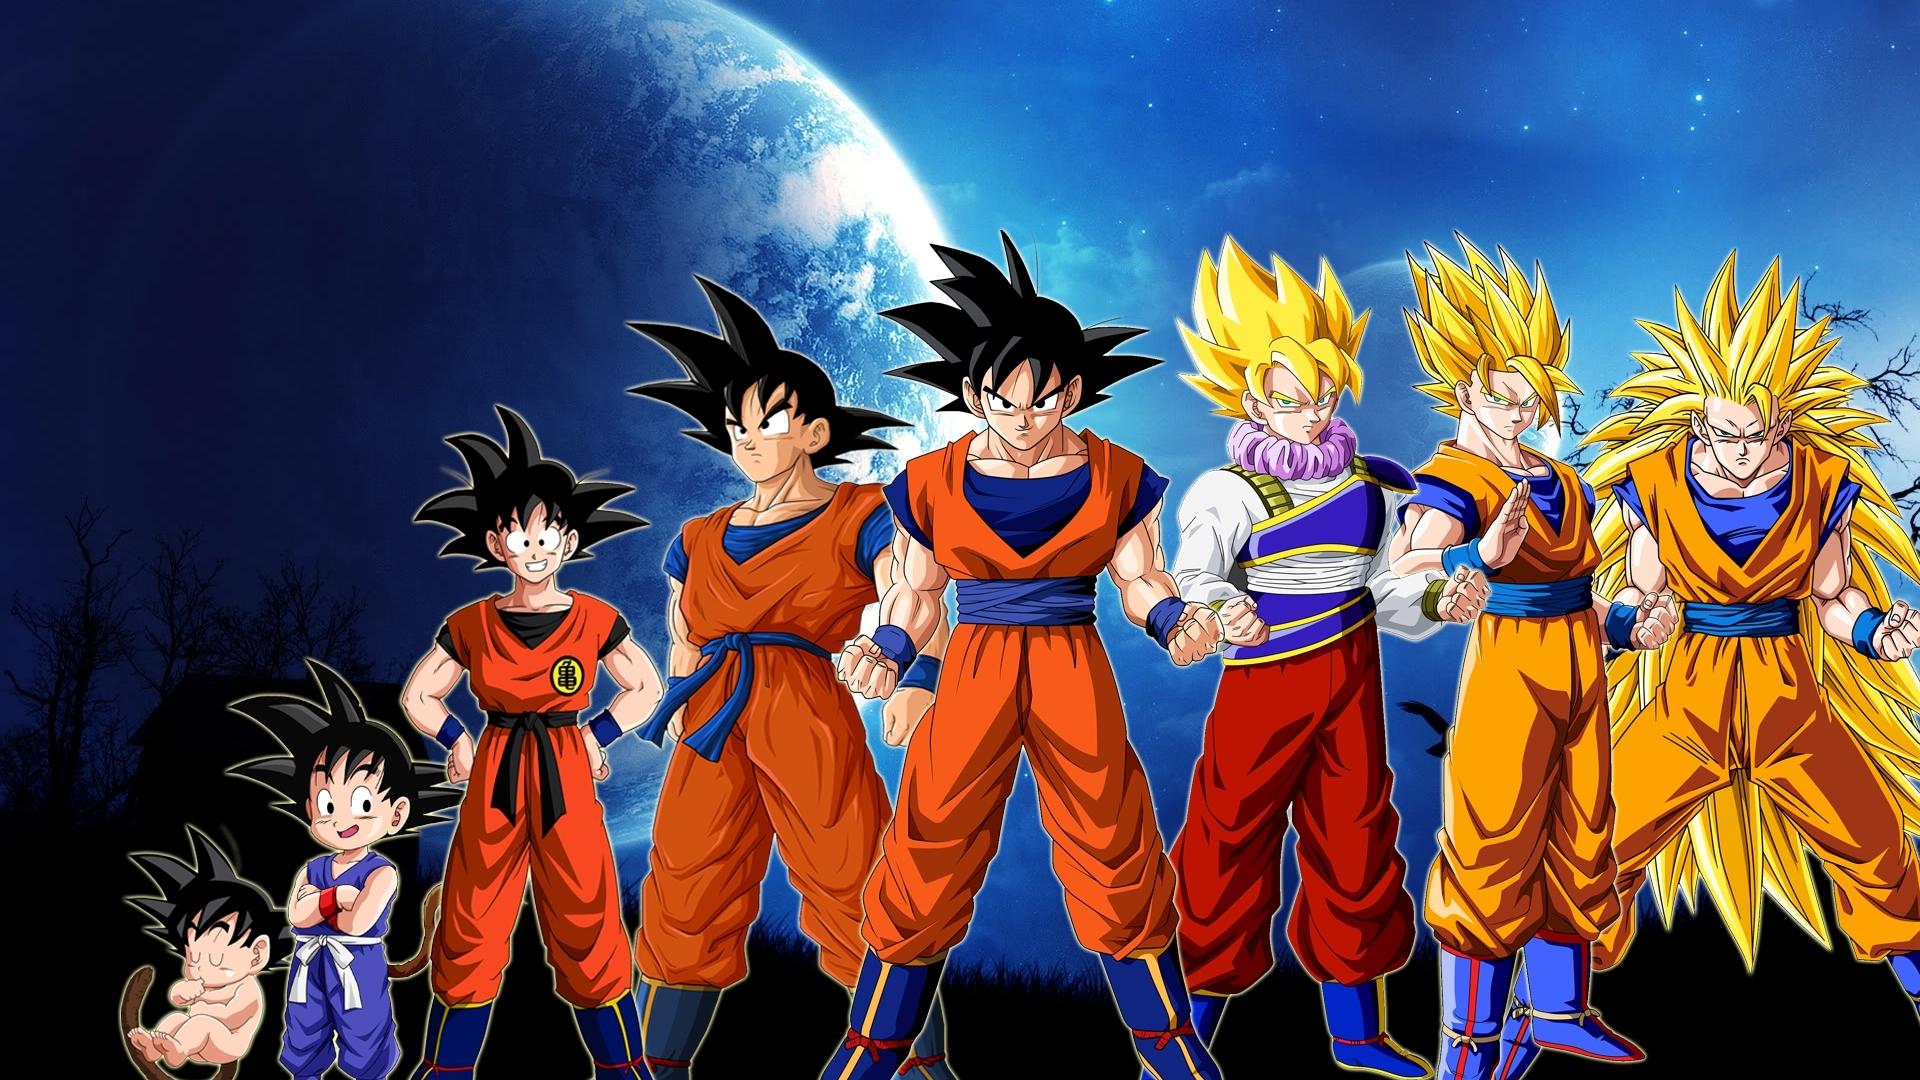 Free Download Download Goku And Super Saiyan Dragonball Z